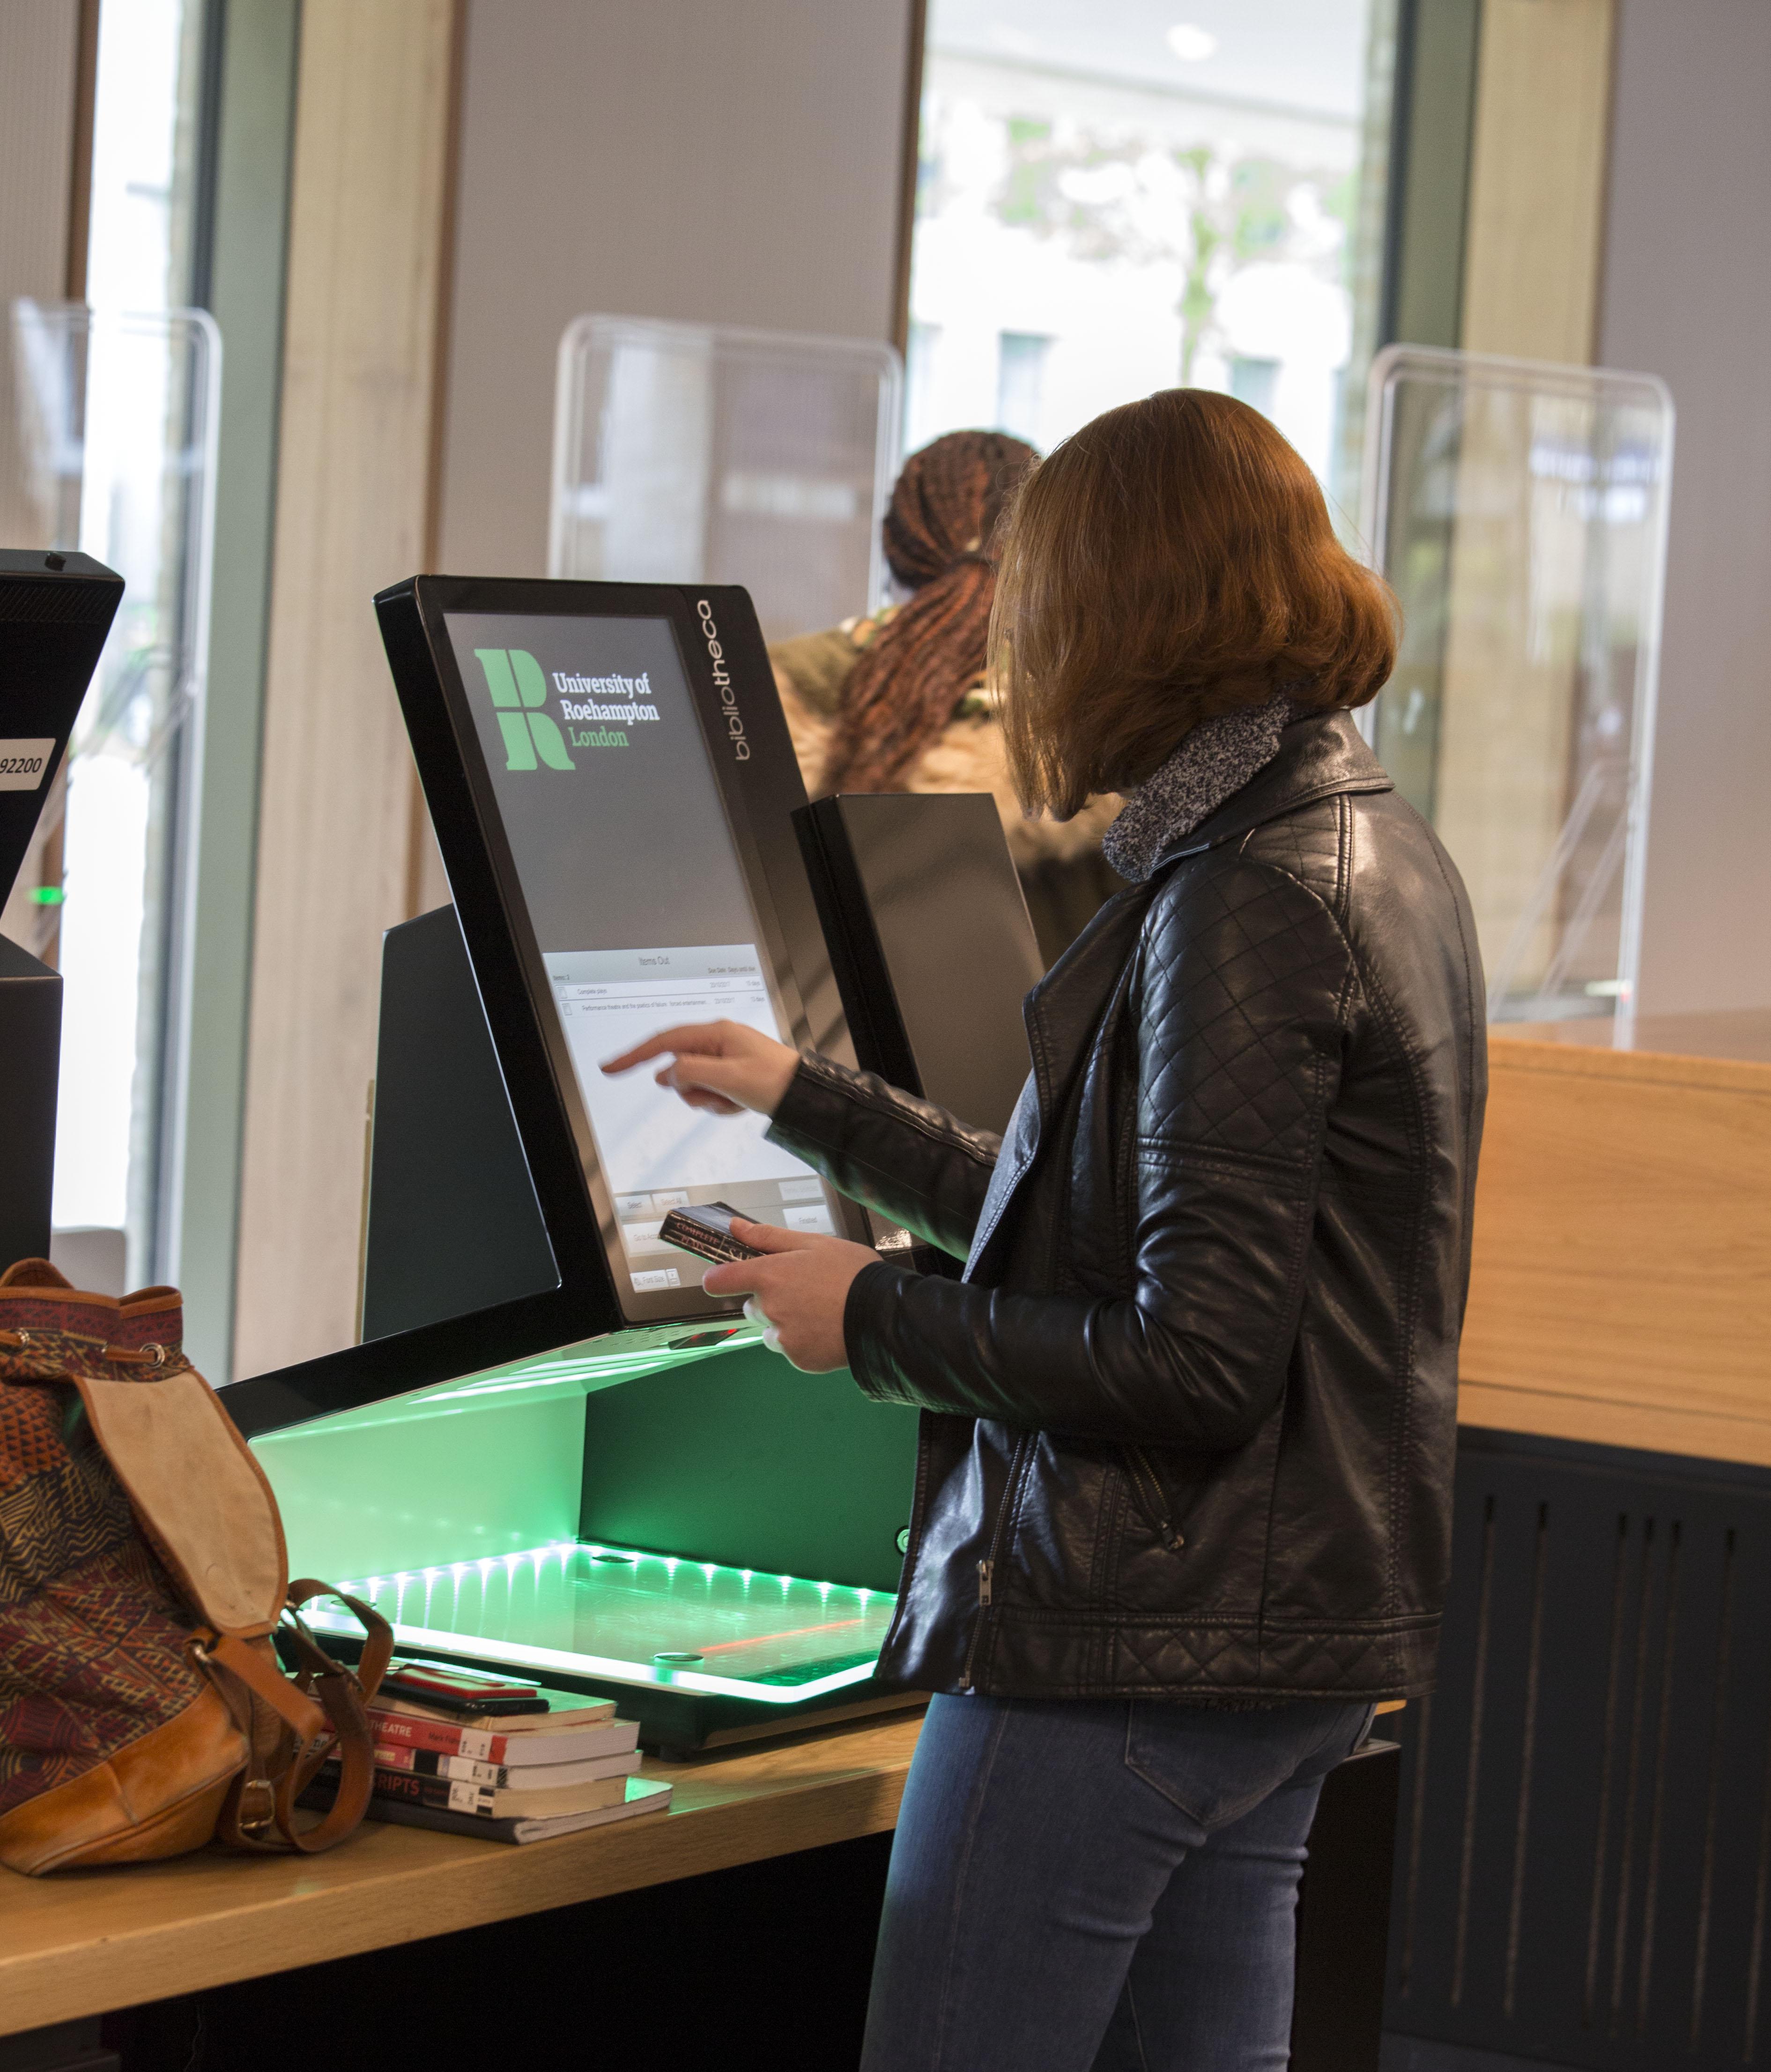 Student borrowing items using self service machine